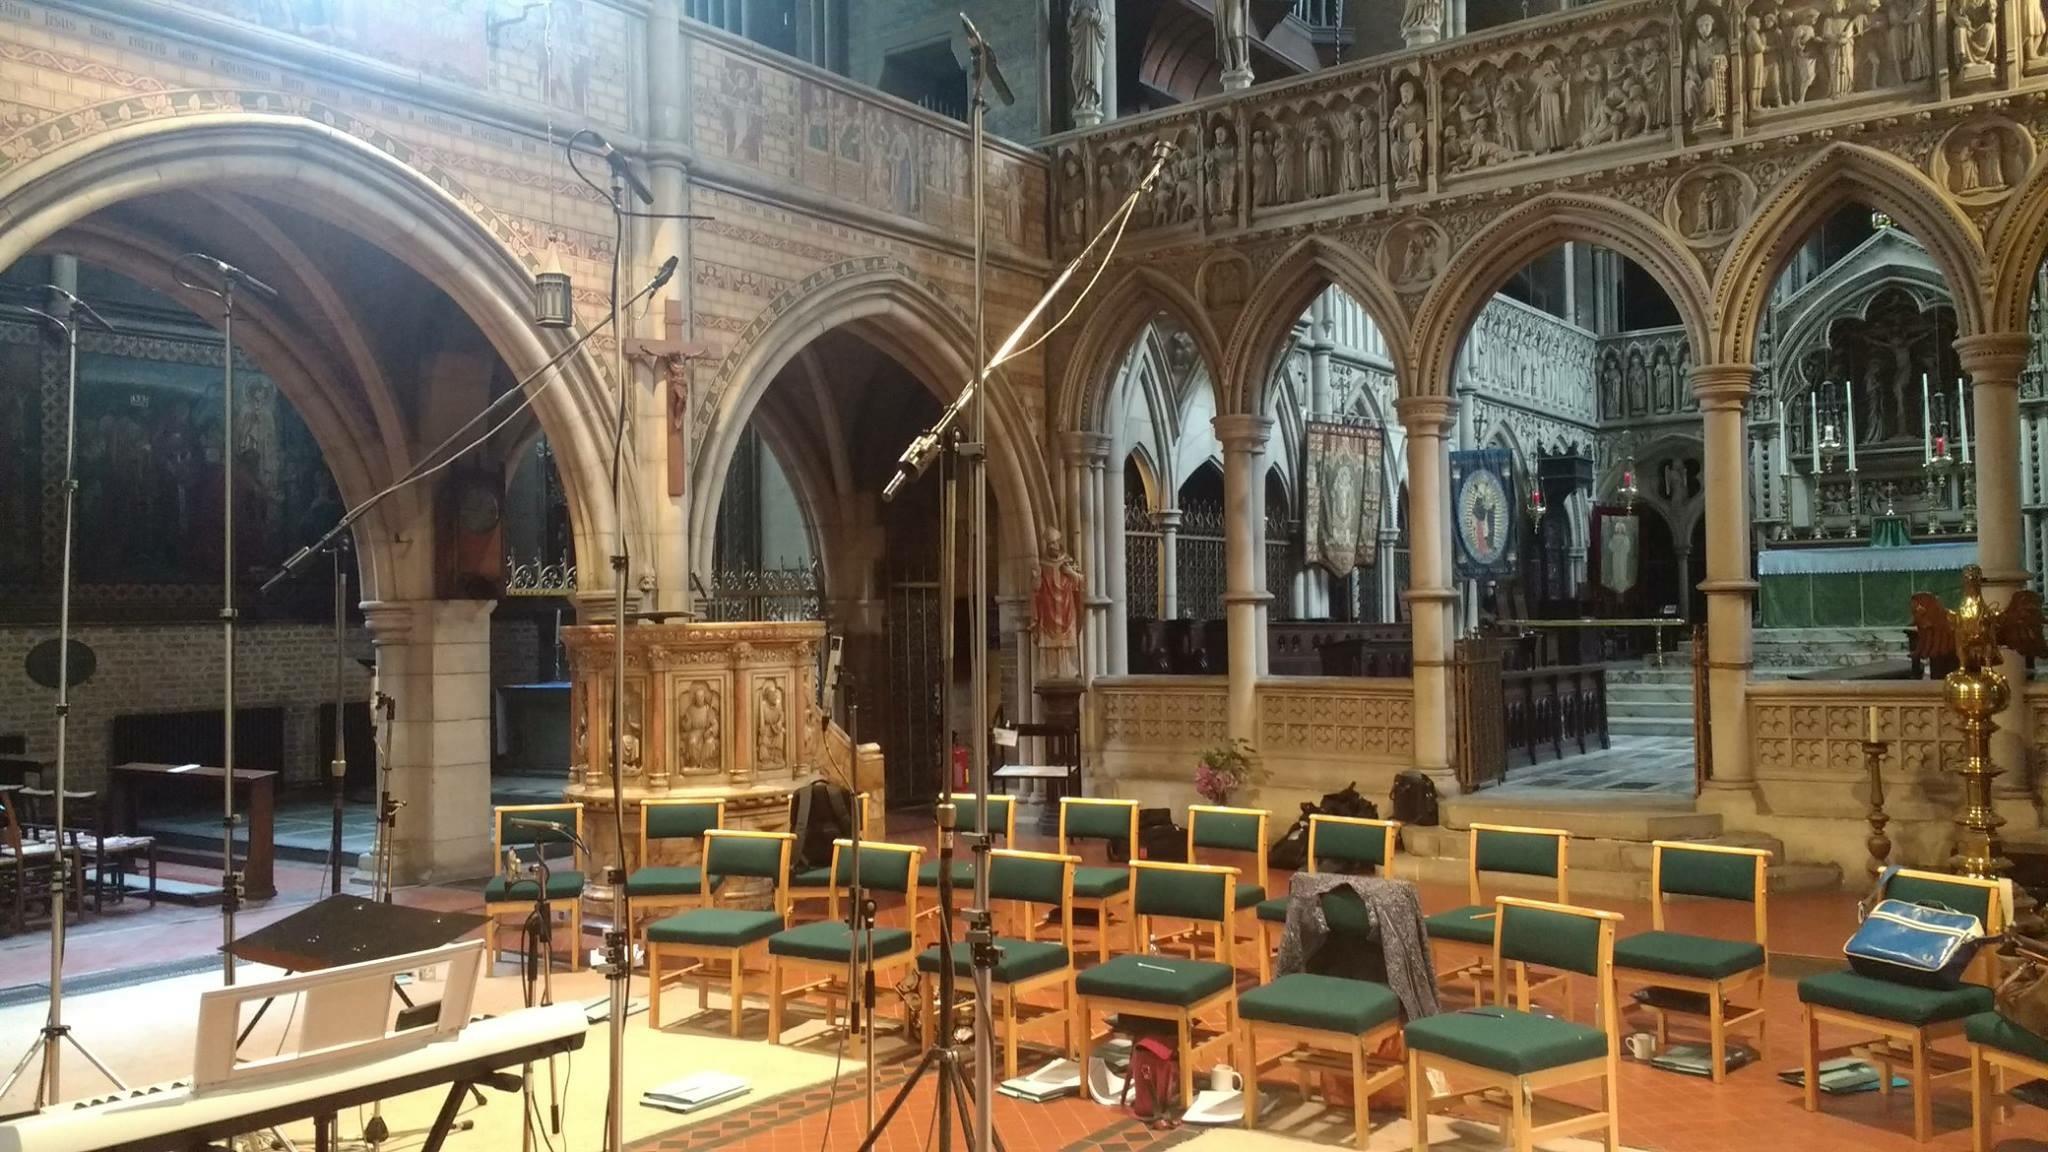 location recording (choir)